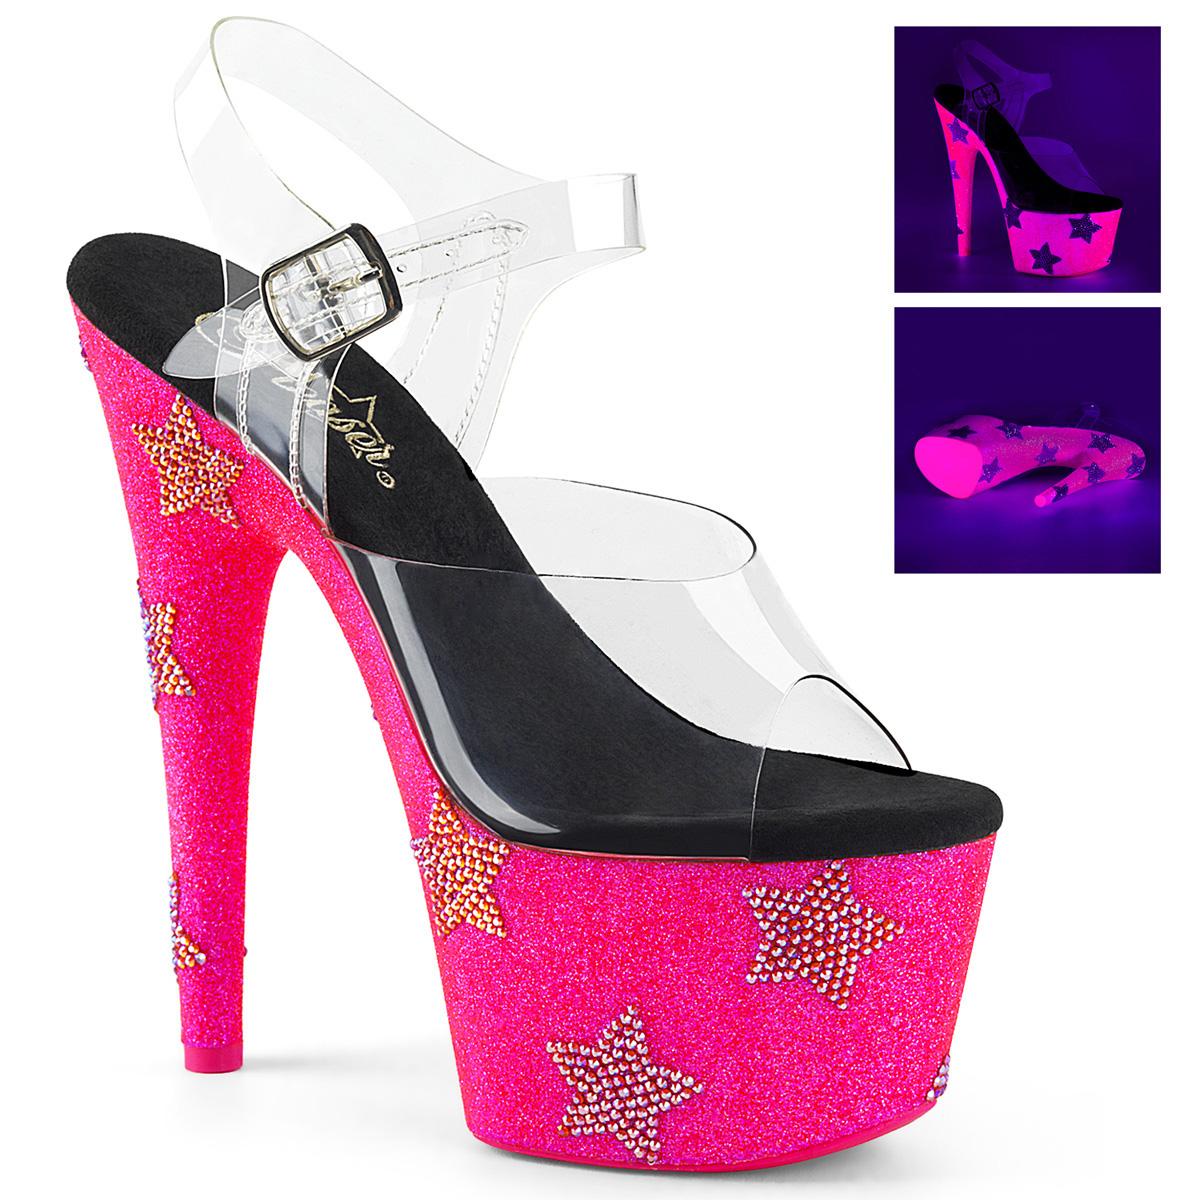 Neon Hot 708star Adore Heels Plateau Pink High ybYf6v7g